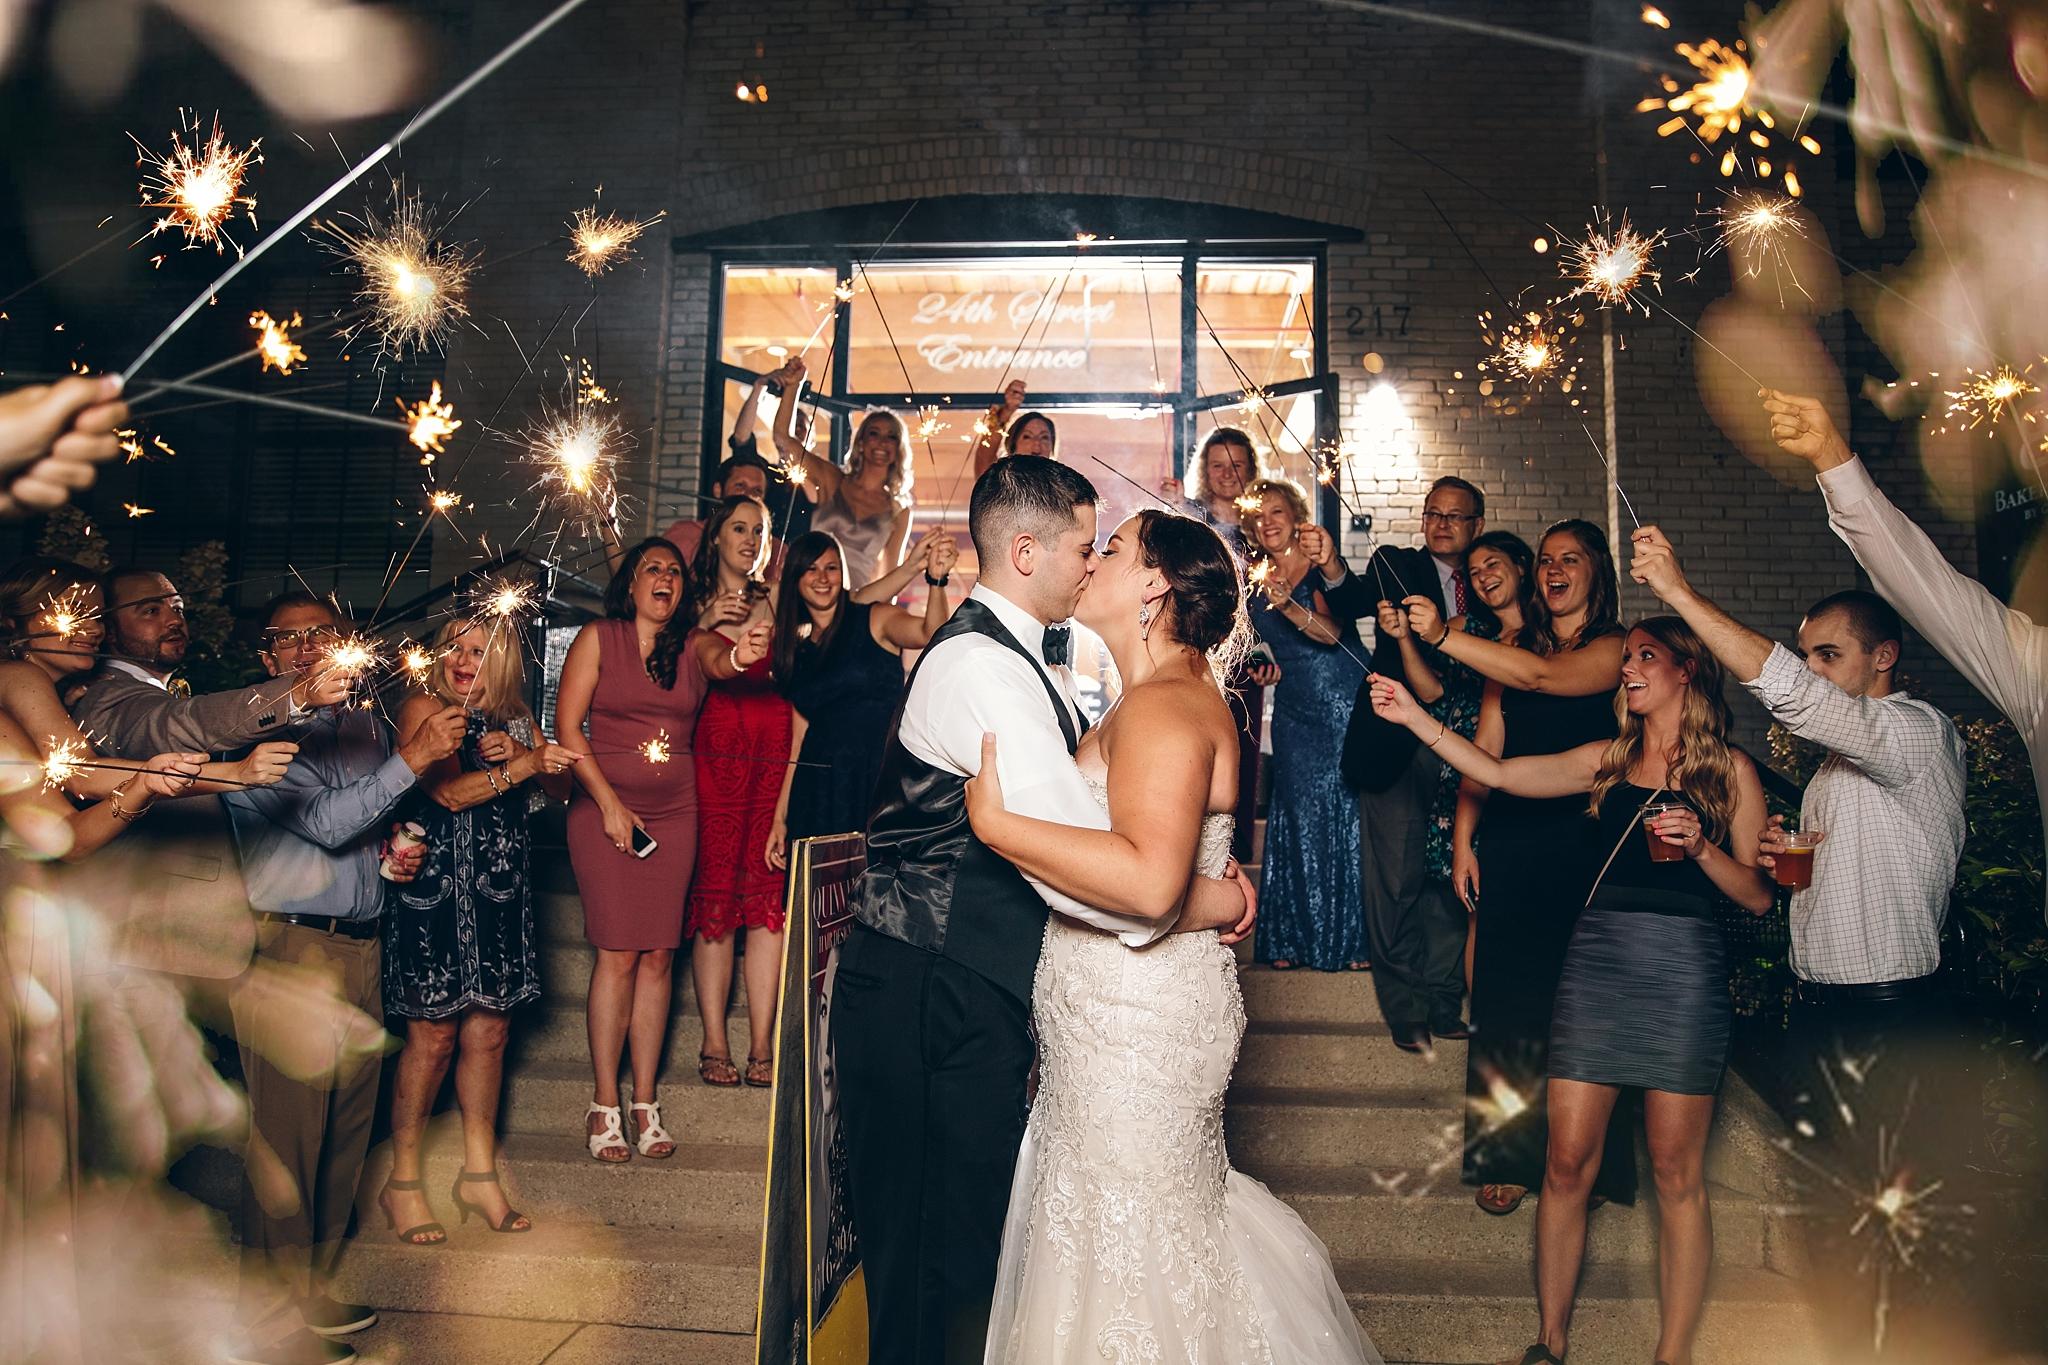 baker-lofts-holland-michigan-wedding-photographer_0414.jpg